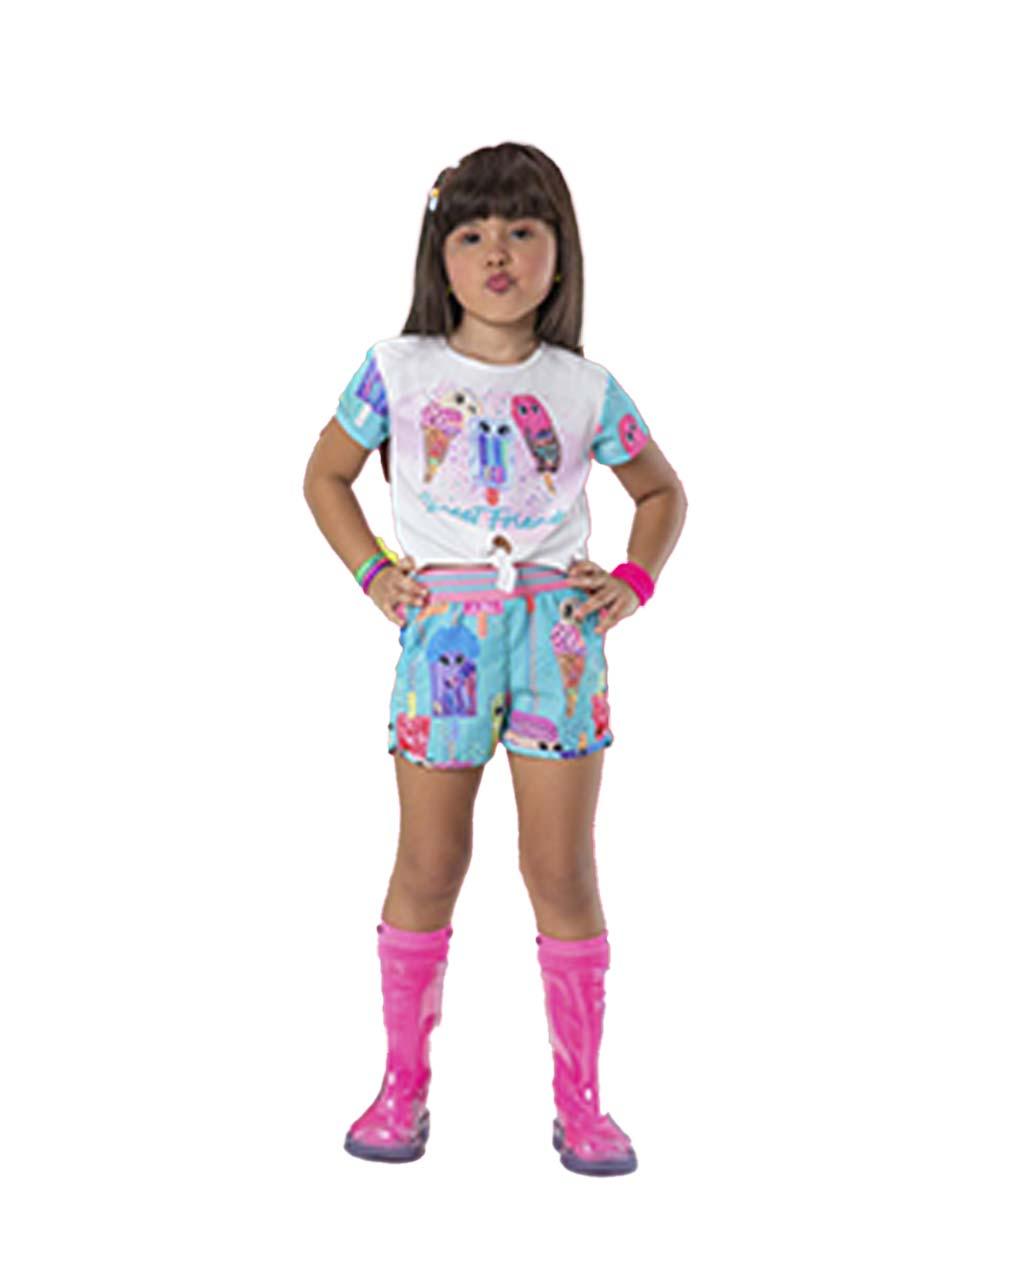 Conjunto Infantil Blusa Nozinho Frontal Soverte Fabuloso com Shorts Málagah